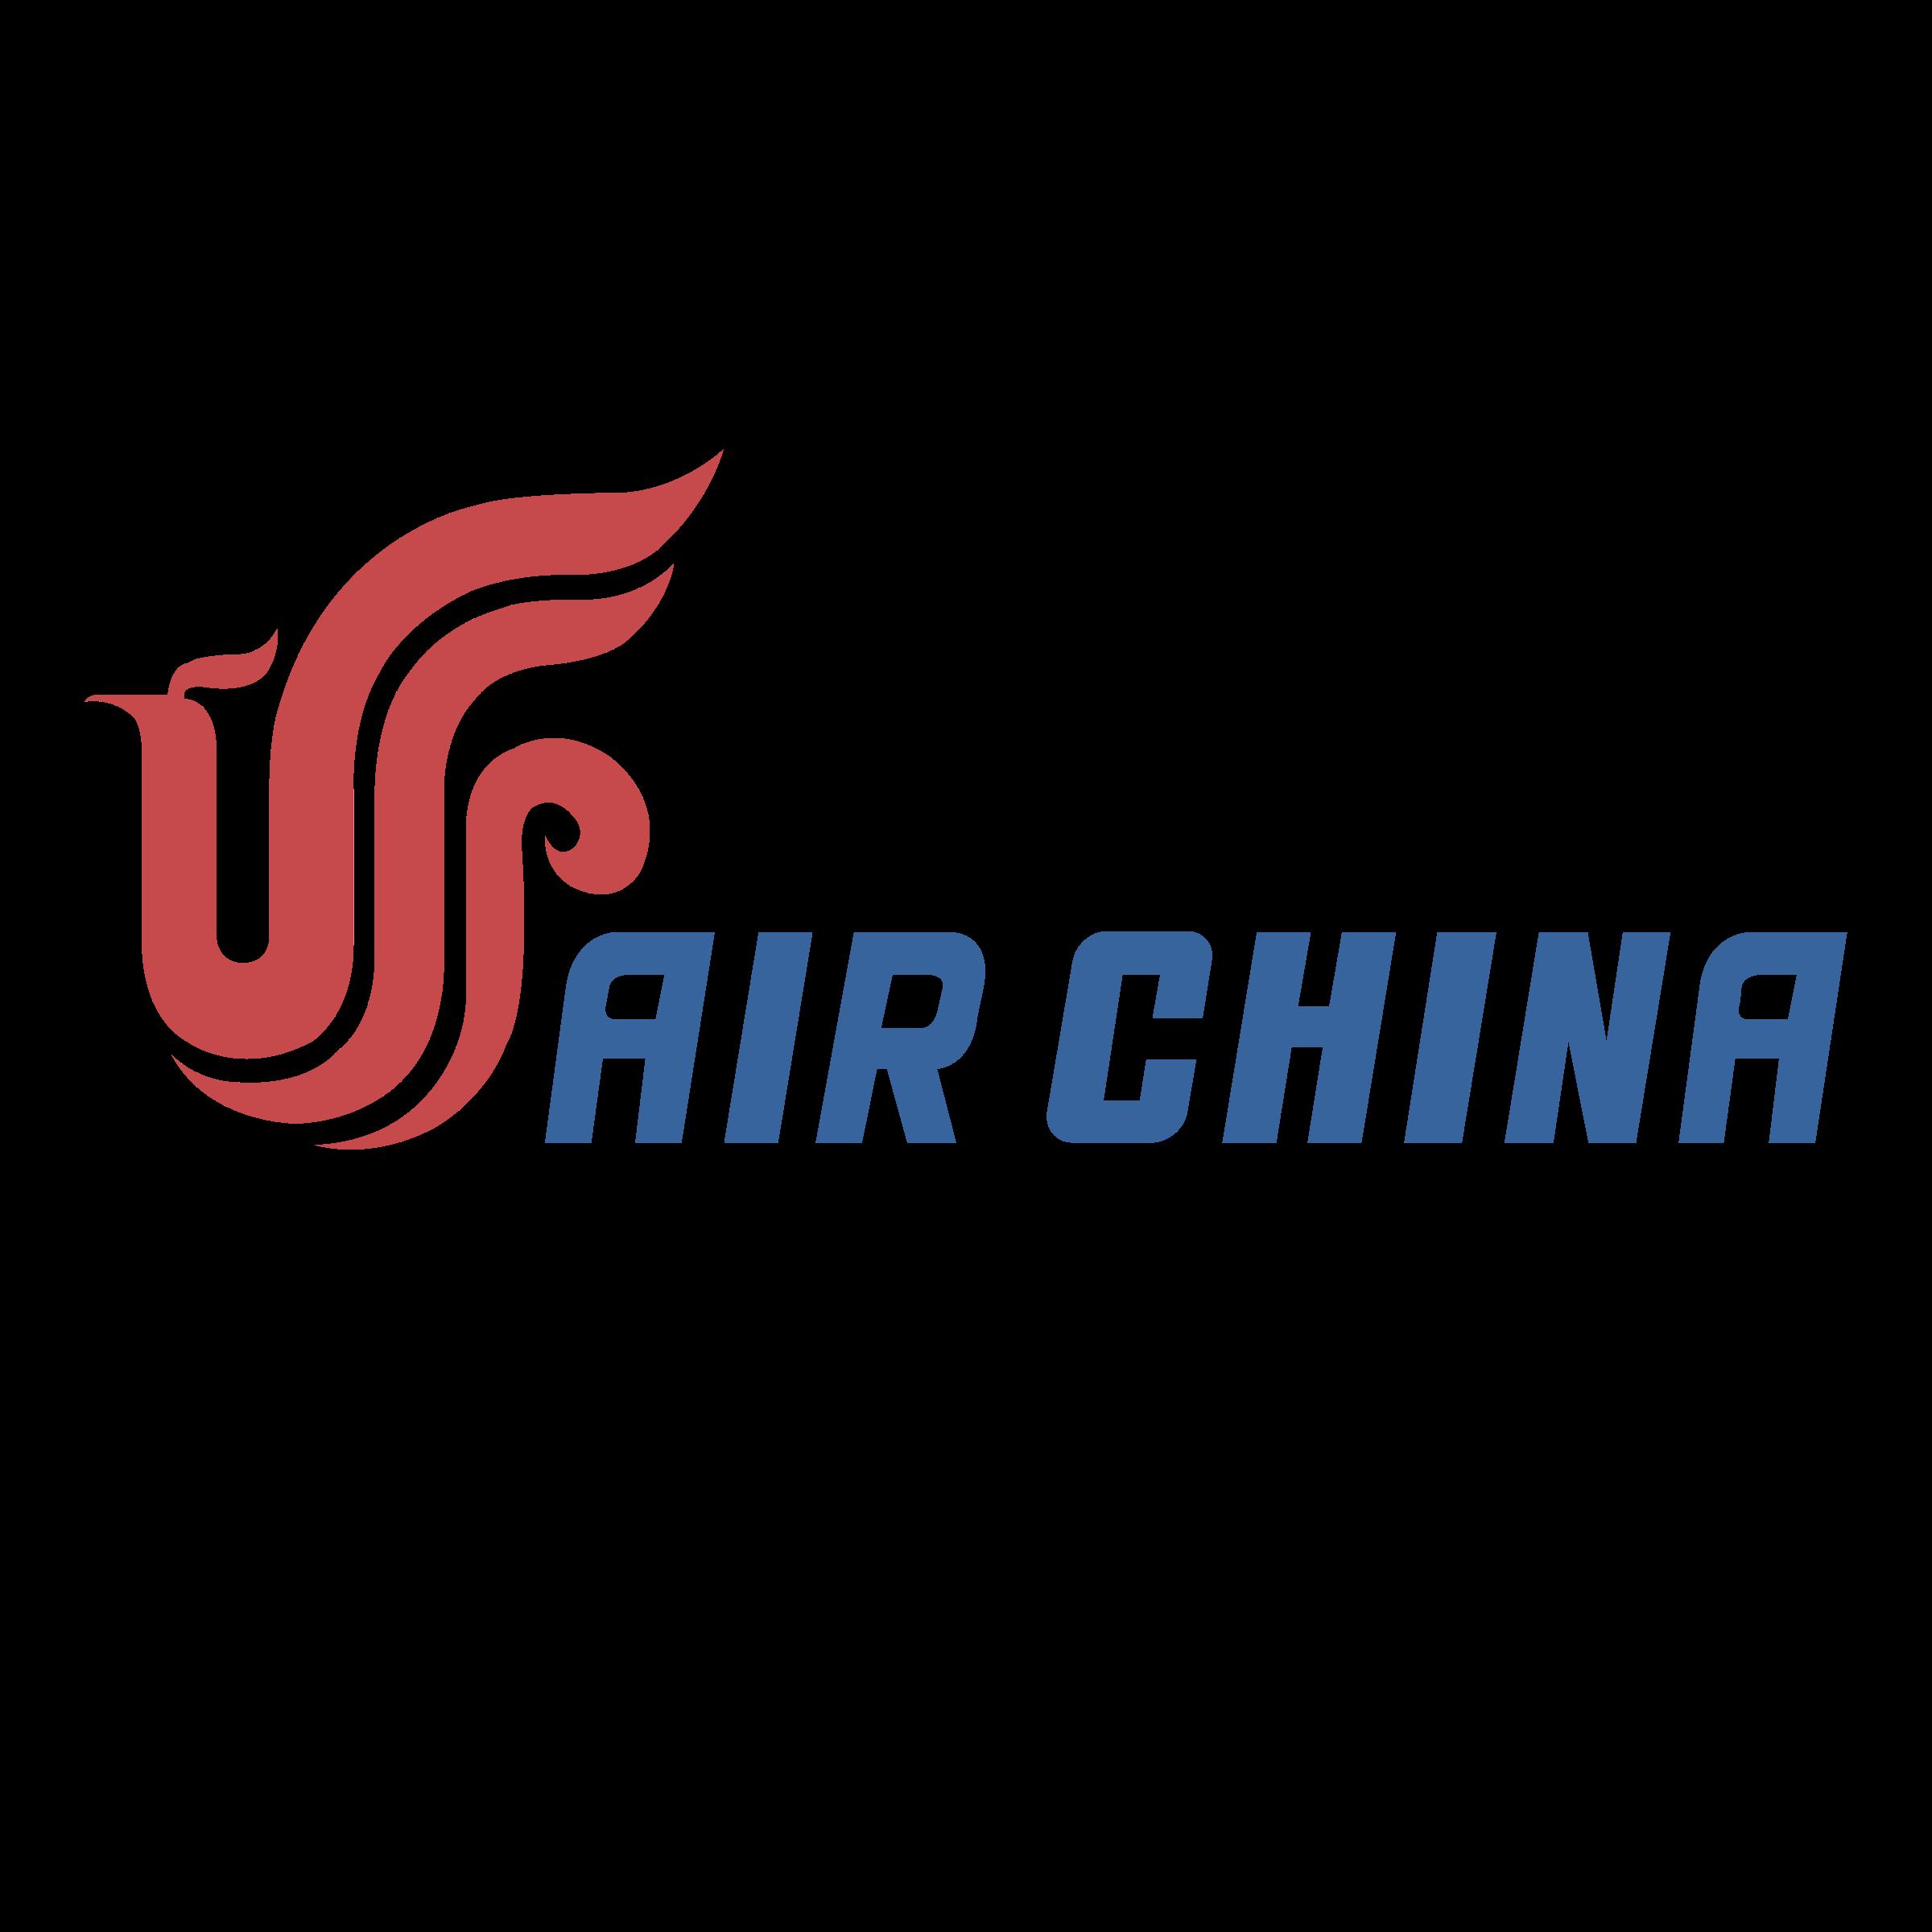 Air China 01 Logo PNG Transparent & SVG Vector.